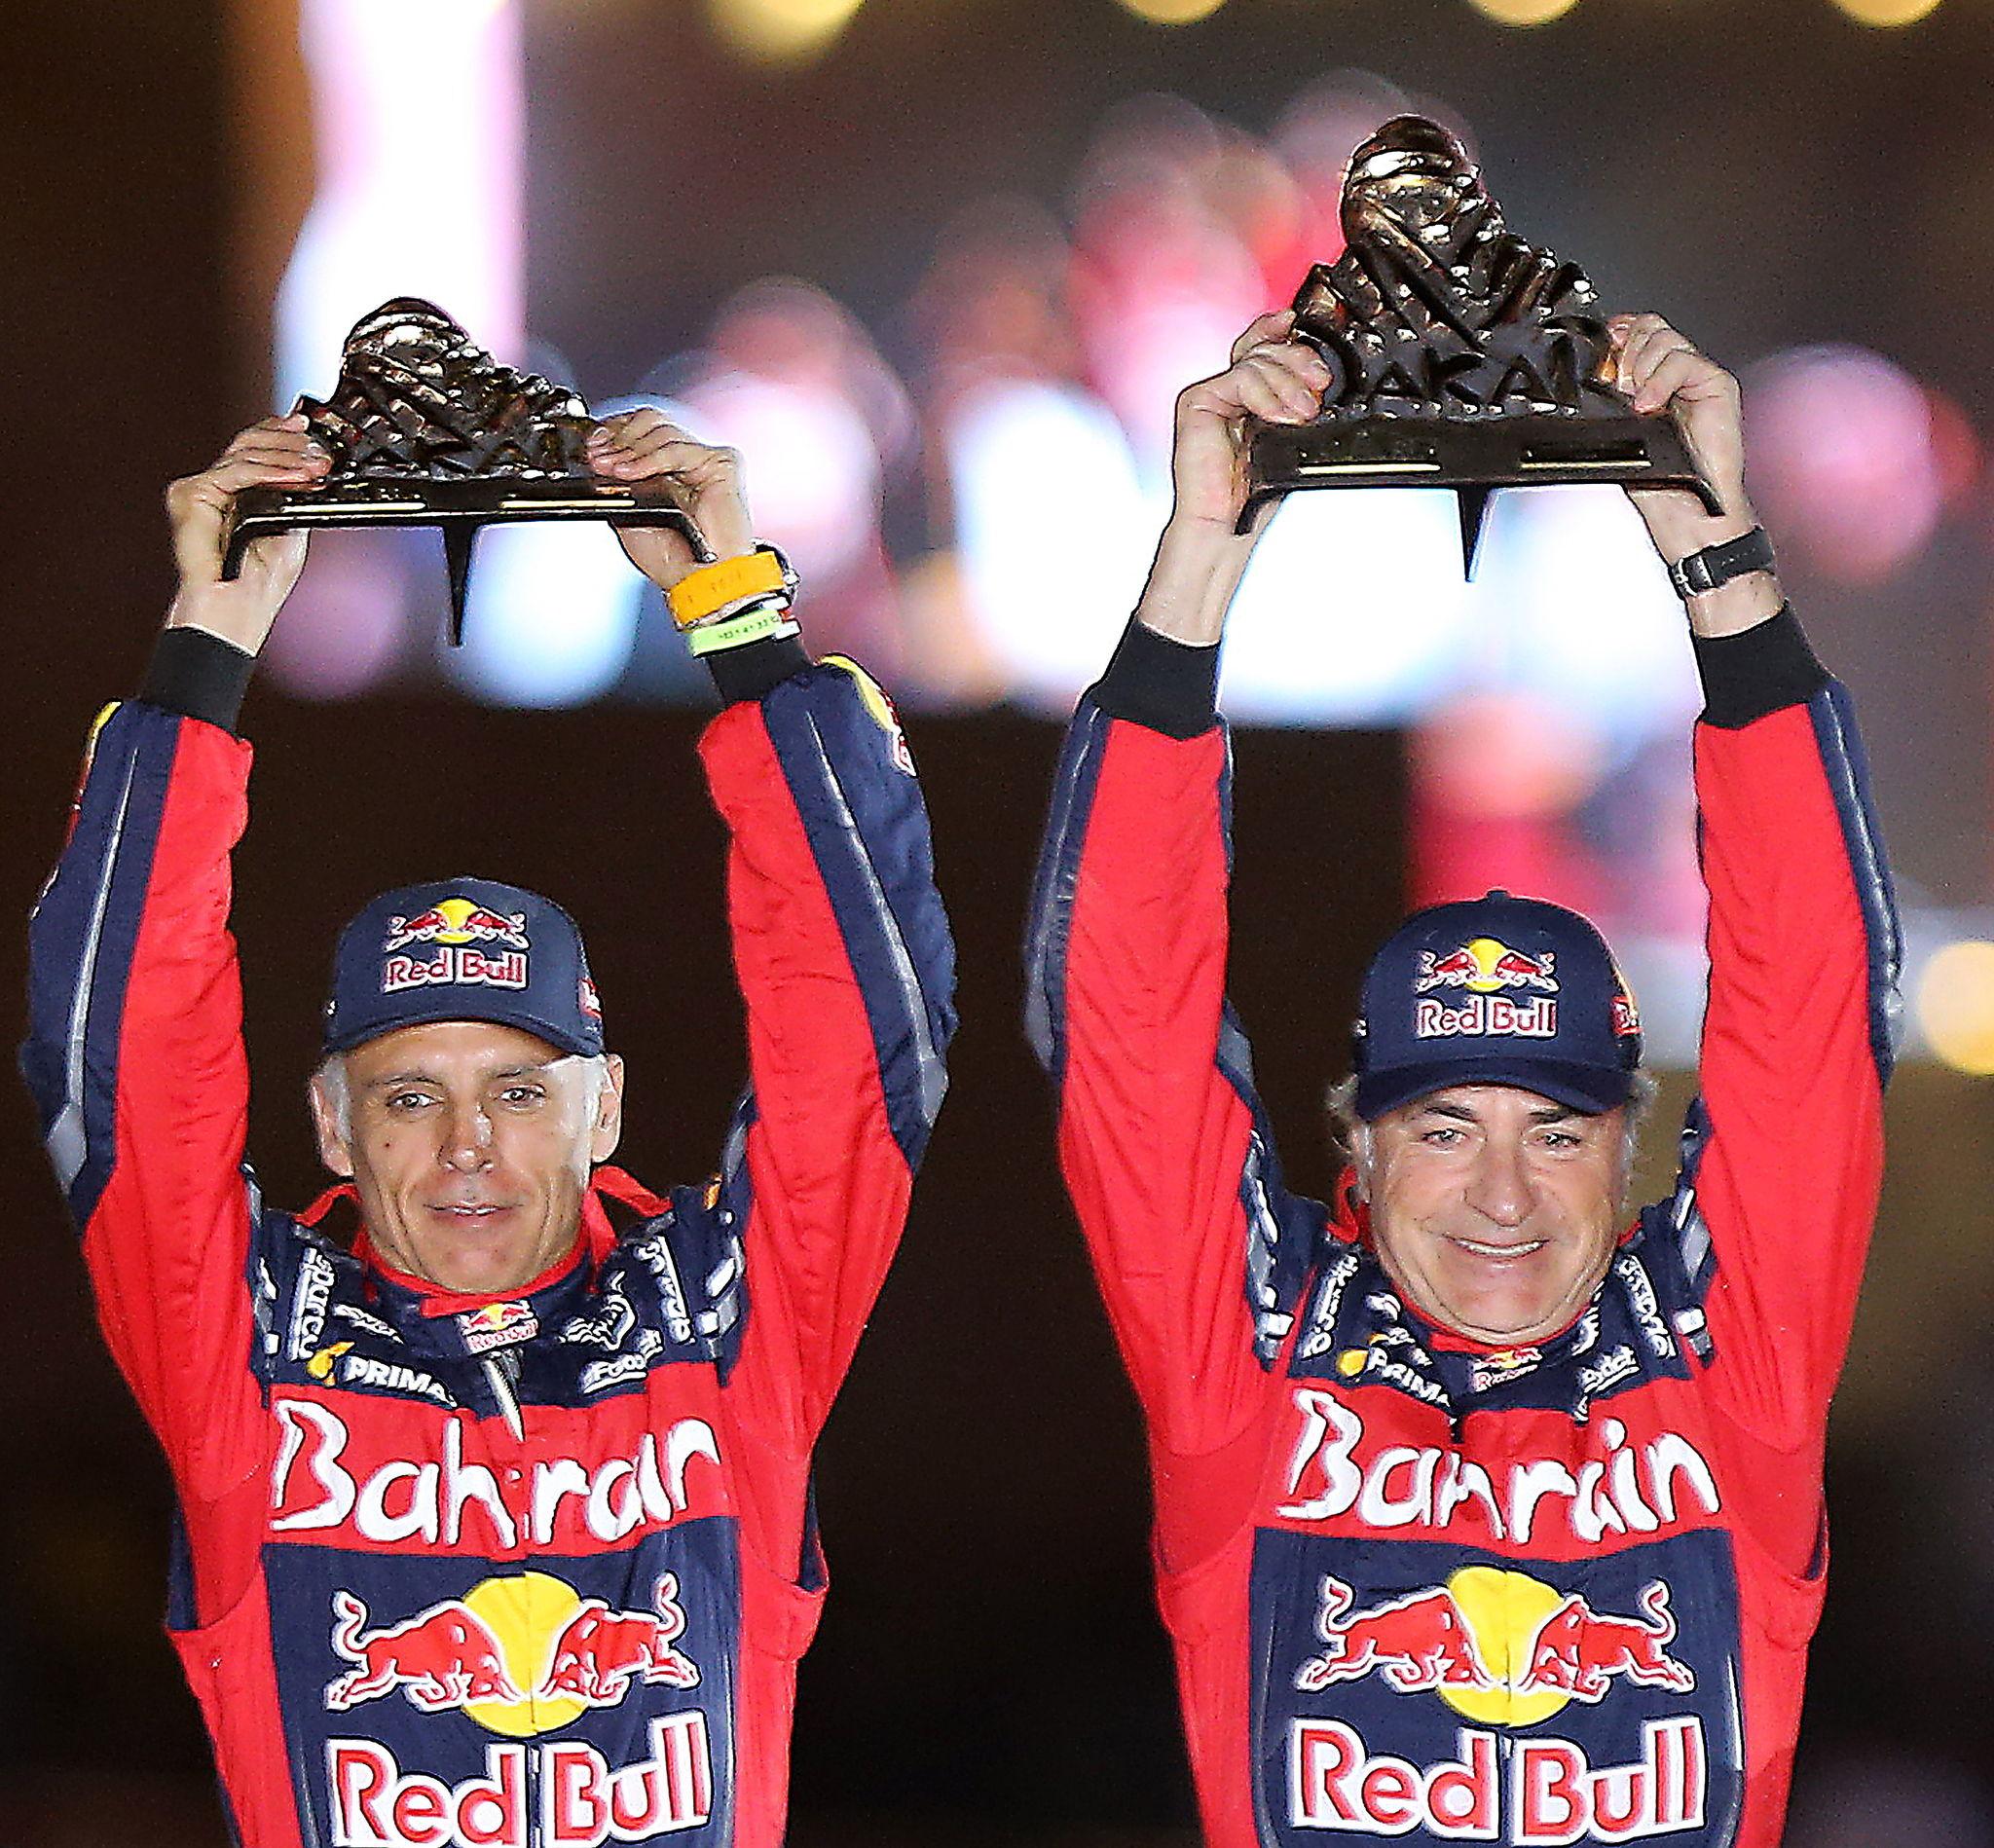 Qiddiya (Saudi Arabia), 17/01/2020.- Winners Spanish Carlos <HIT>Sainz</HIT> (Bahrain JCW X-Raid Team) and co-driver Lucas <HIT>Cruz</HIT> (R) hold the trophies as they celebrate their victory during the podium ceremony for the car category after the last stage of the Rally Dakar 2020 in Qiddiya, Saudi Arabia, 17 January 2020. (Bahrein, Arabia Saudita) EFE/EPA/STR